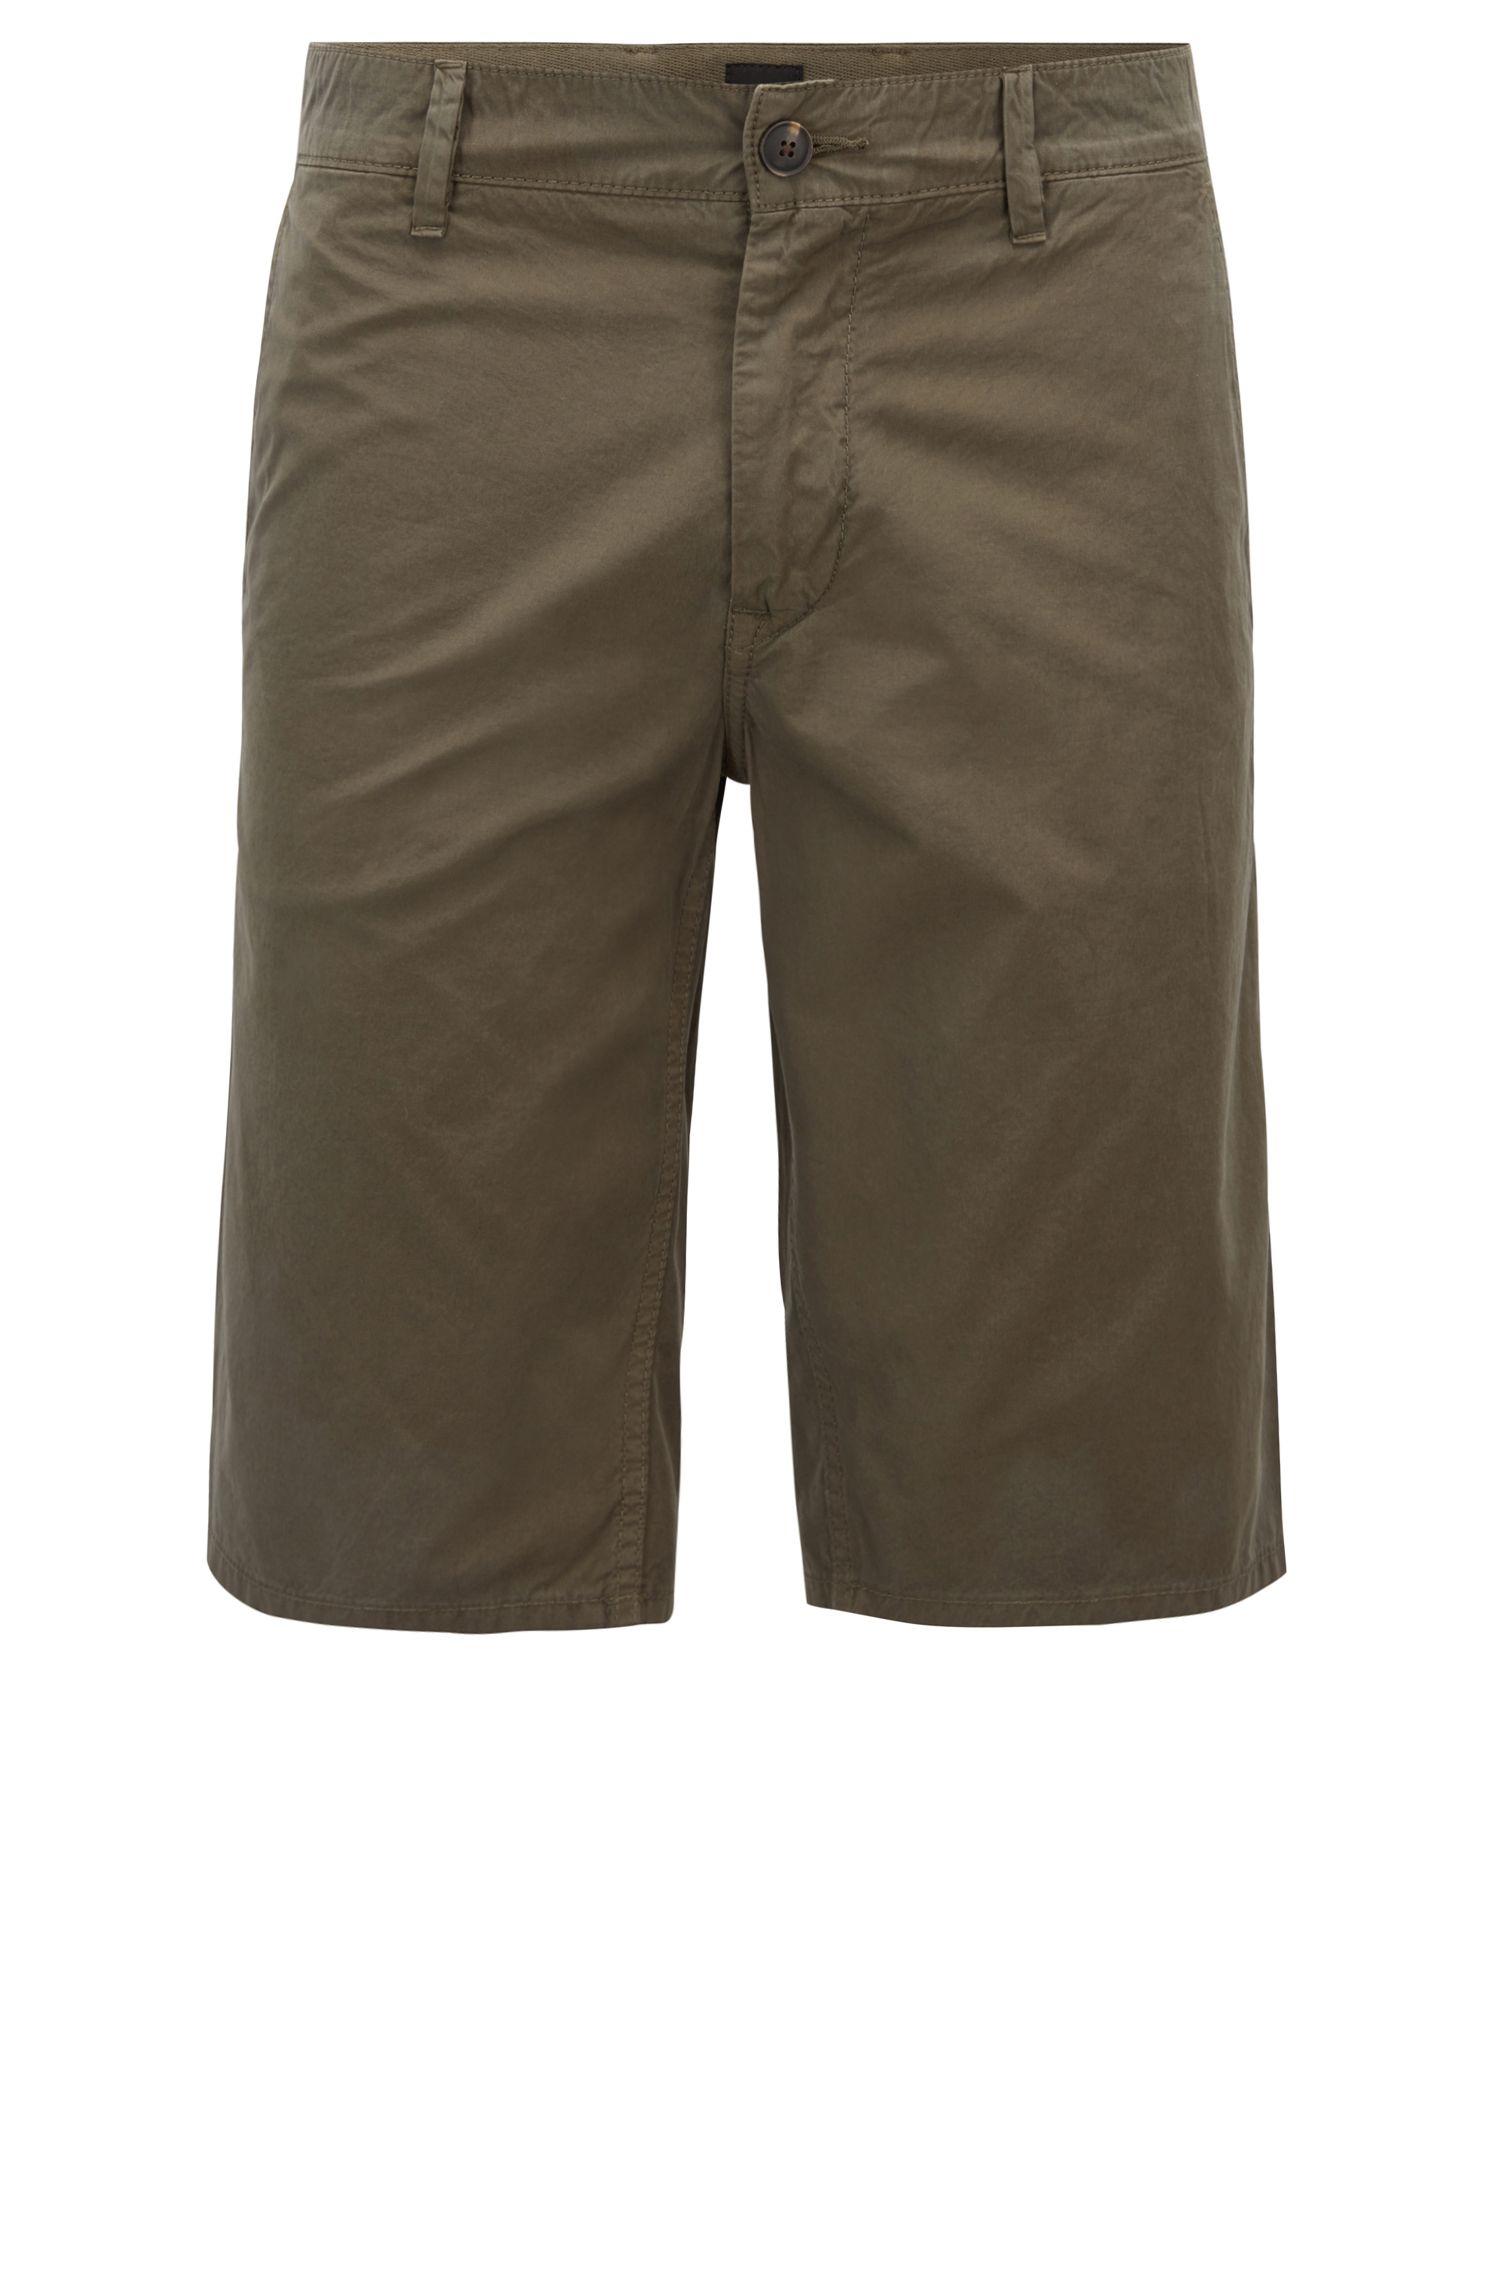 Shorts slim fit en popelín de algodón con teñido especial, Verde oscuro